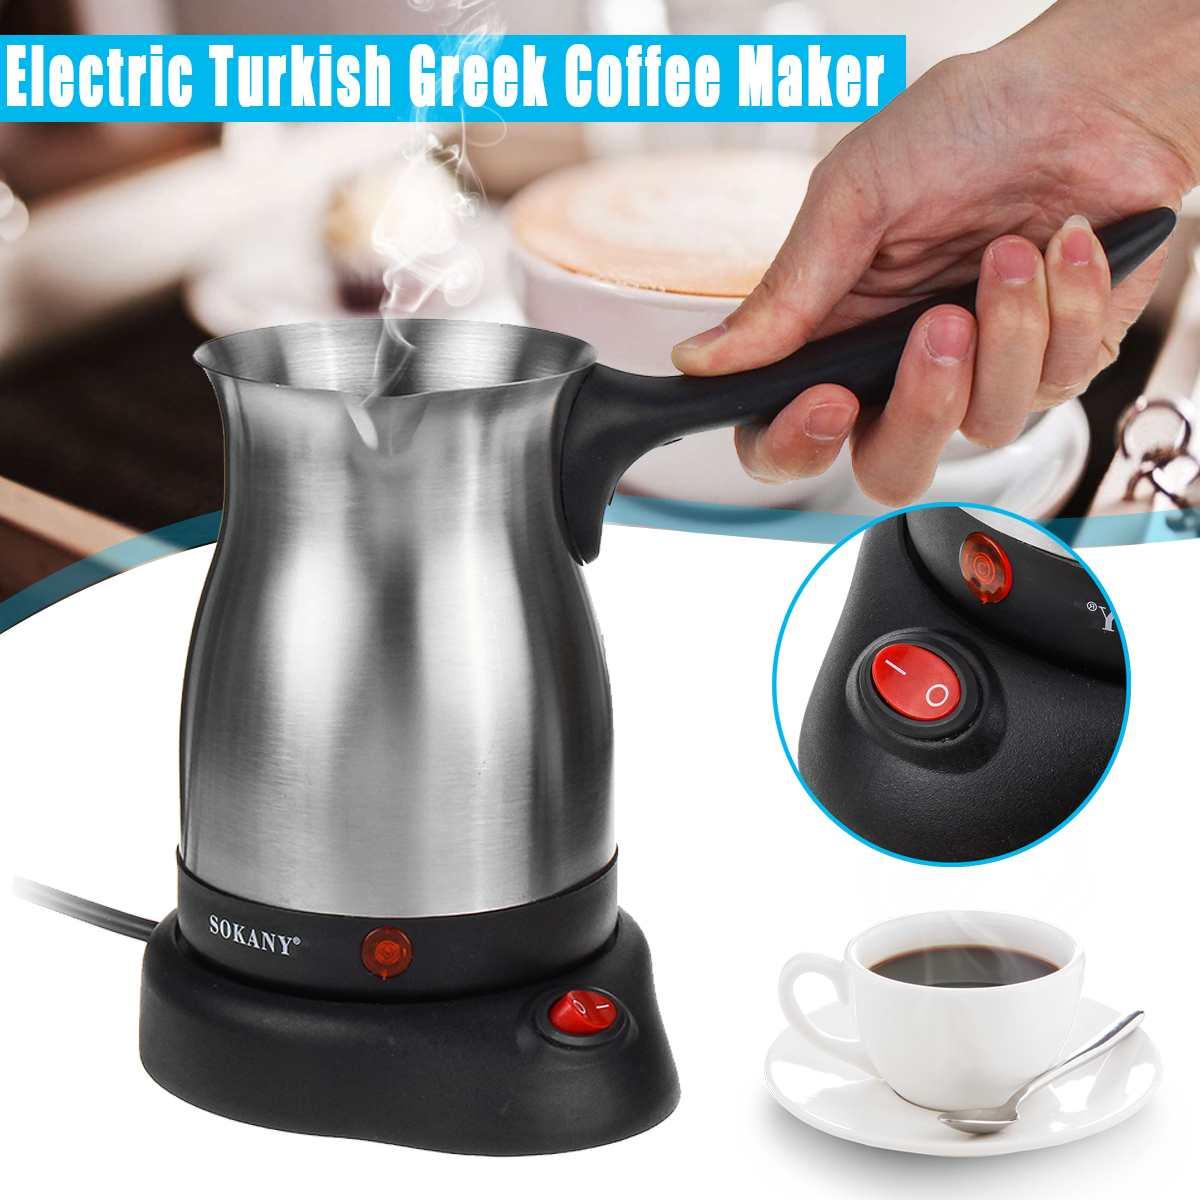 Stainless Steel Electric Turkish Greek Coffee Maker 220V-240V 800W Machine Espresso Moka Pot Waterproof IPX4 Mulfunctional